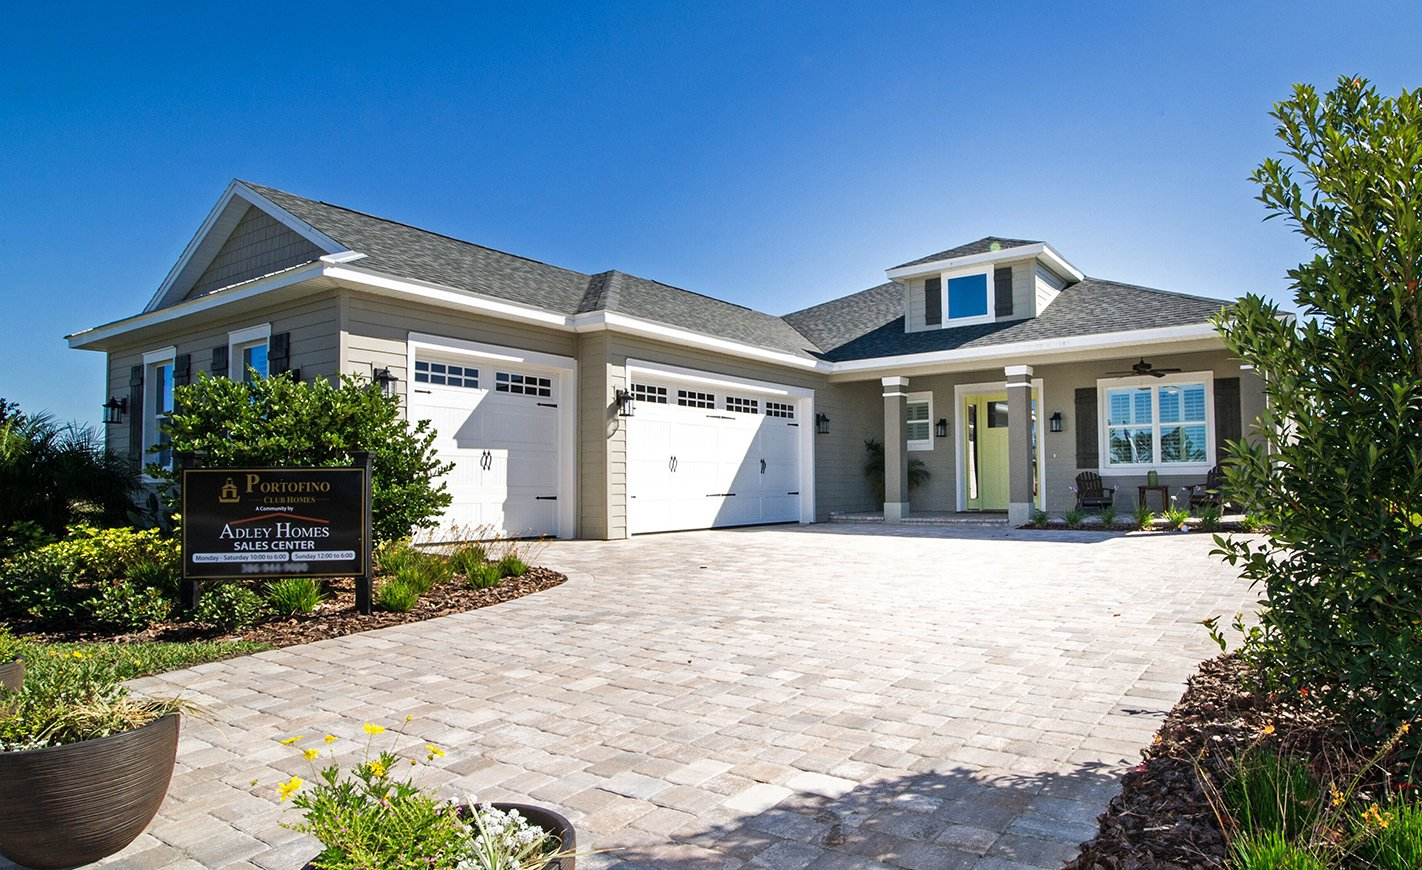 Daytona Beach Homes for Sale - The Summerland at Mosaic